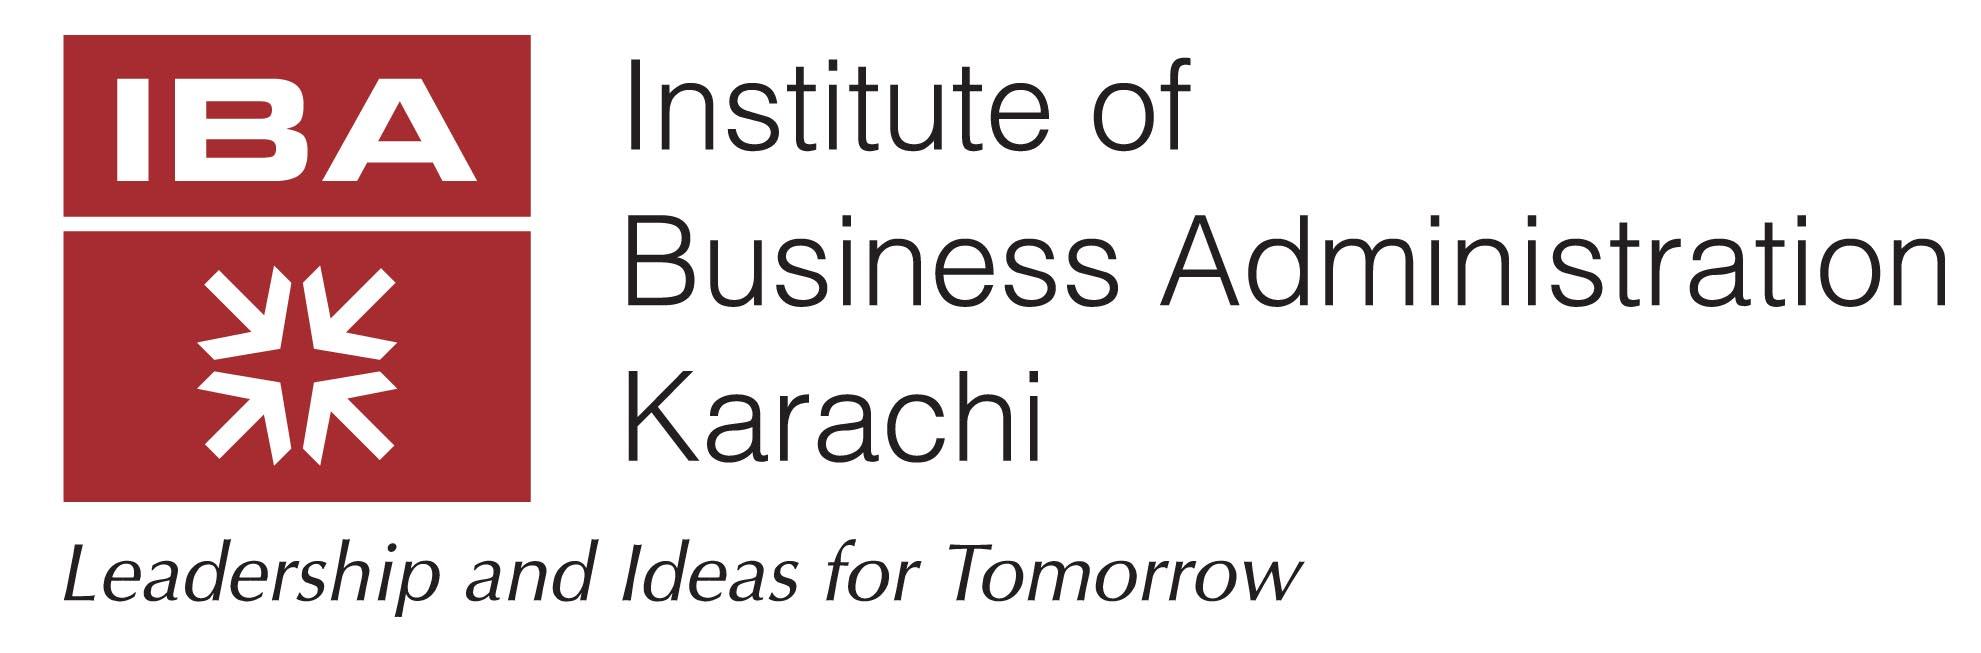 IBA Karachi Admission 2017 BBA, MBA Form, Requirement, Criteria